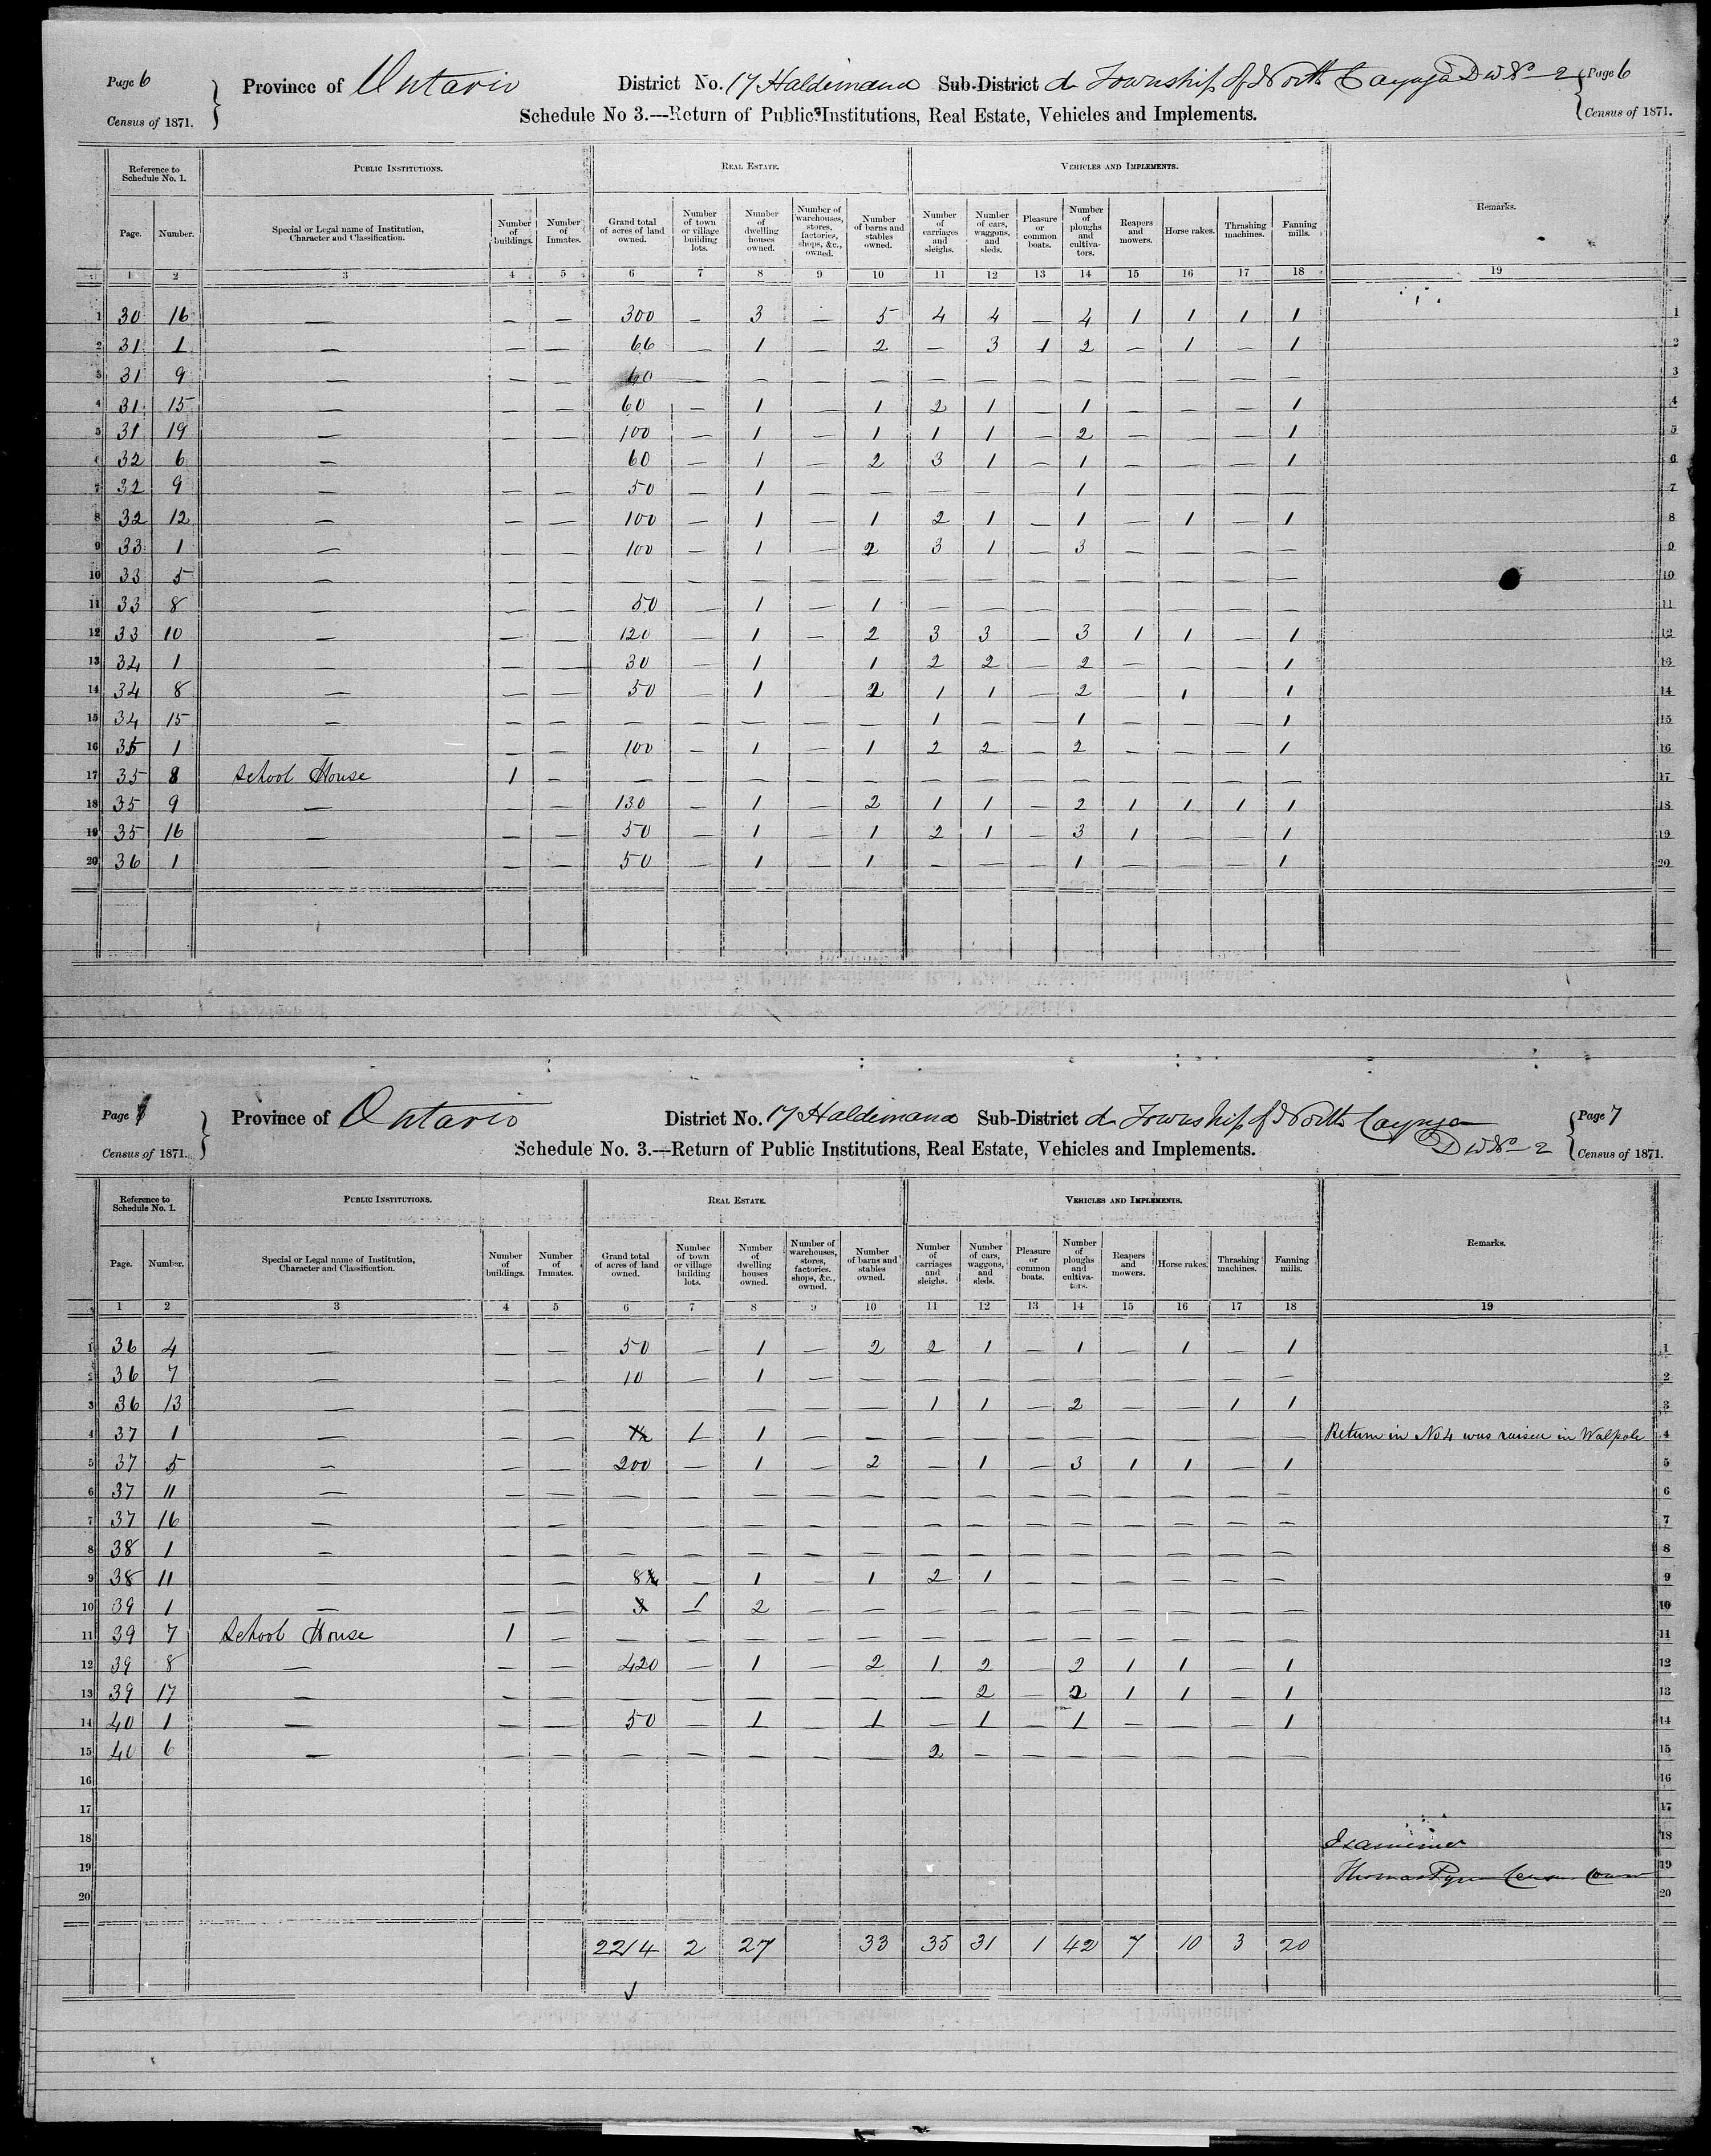 Titre: Recensement du Canada (1871) - N° d'enregistrement Mikan: 194056 - Microforme: c-9917